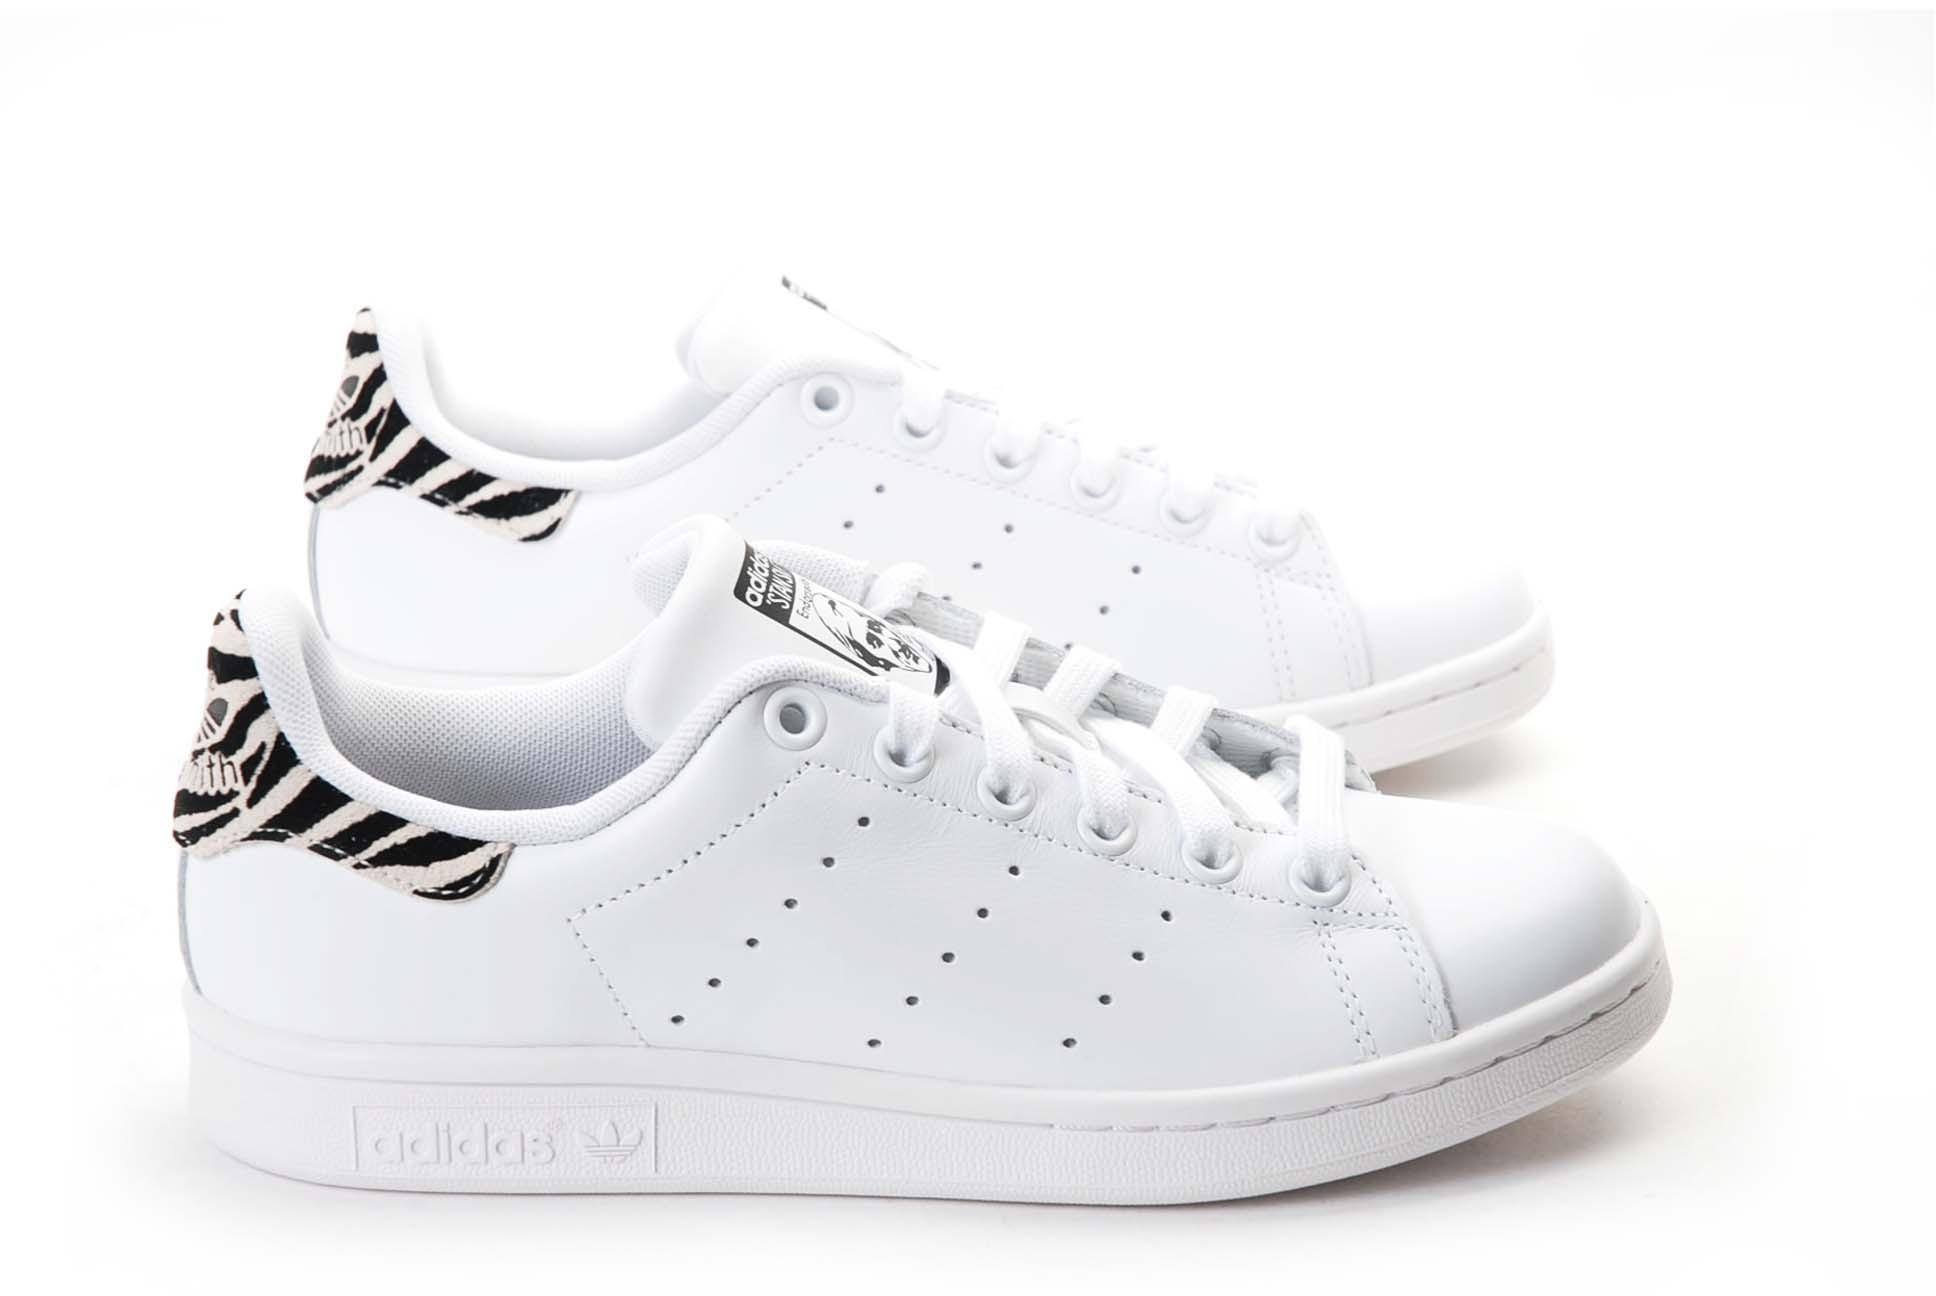 Vente adidas stan smith zebre homme Gatorade Daim Vert Pas Chers Livraison  gratuite, Basket de trs haute qualit. - homemedical.fr 2a4c16693922